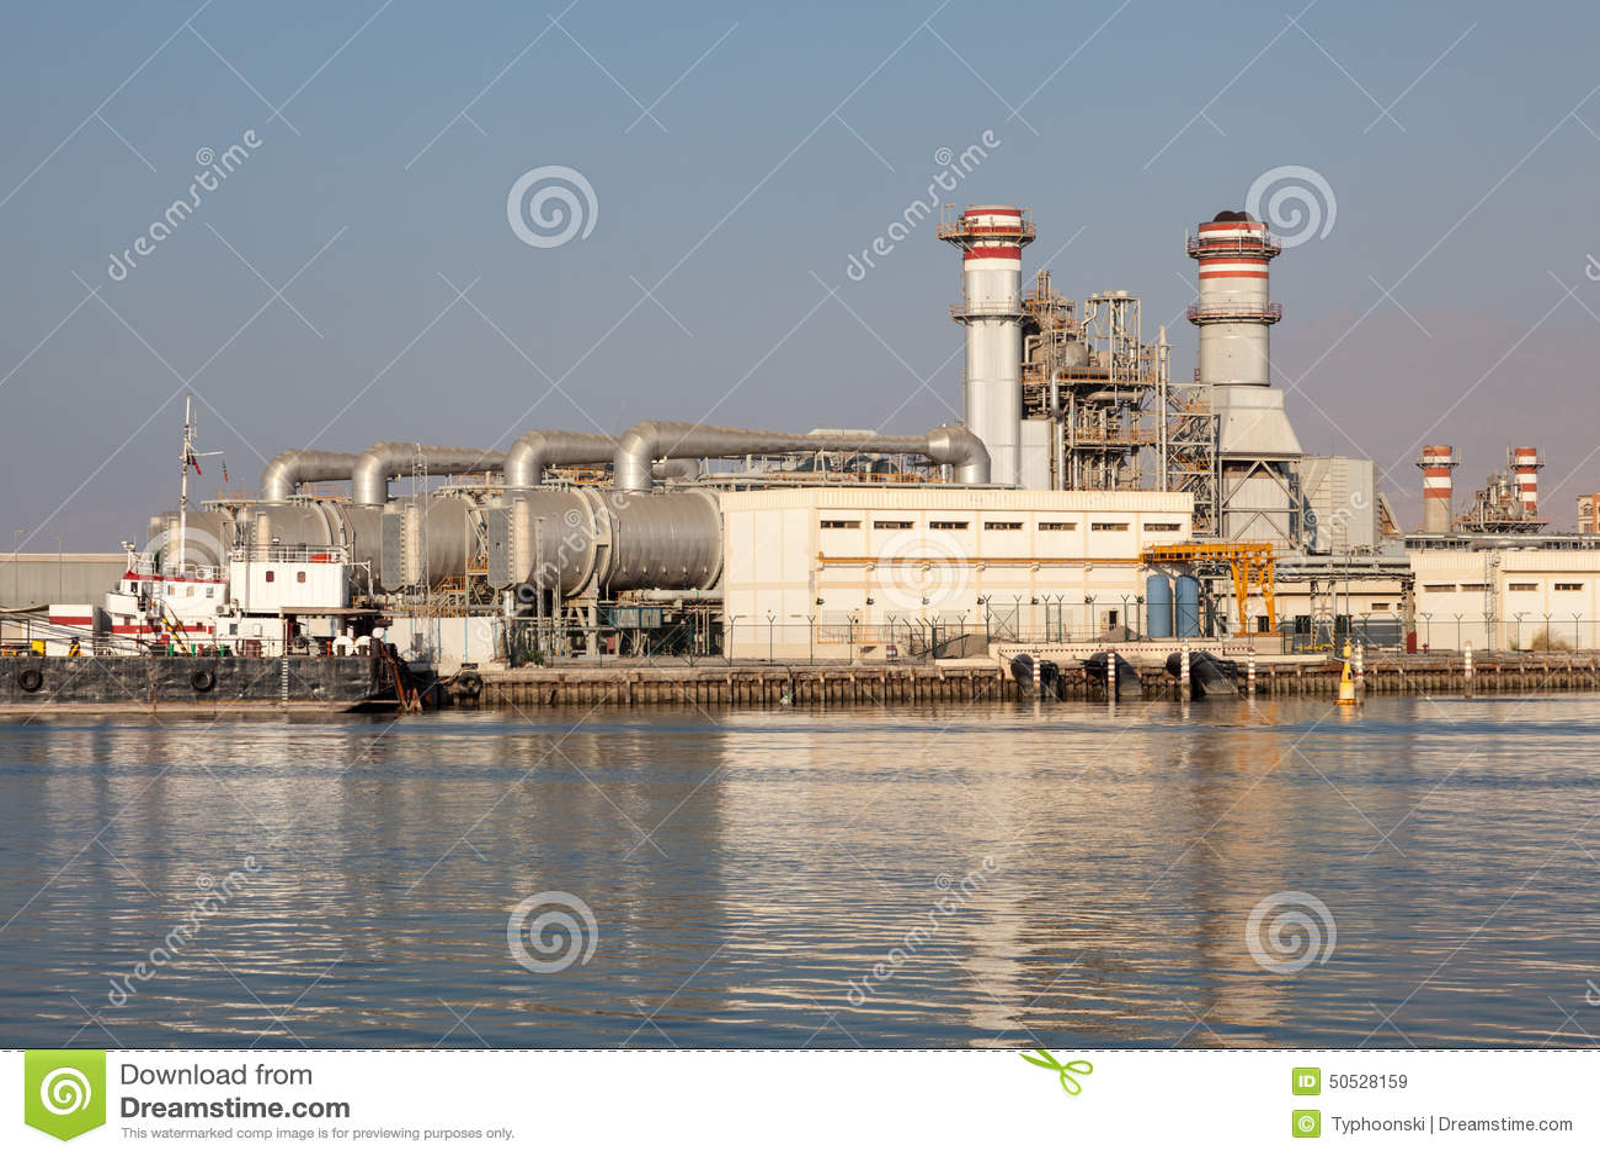 Ras Al Khaimah United Arab Emirates  city photo : Power station in Ras Al Khaimah, United Arab Emirates.